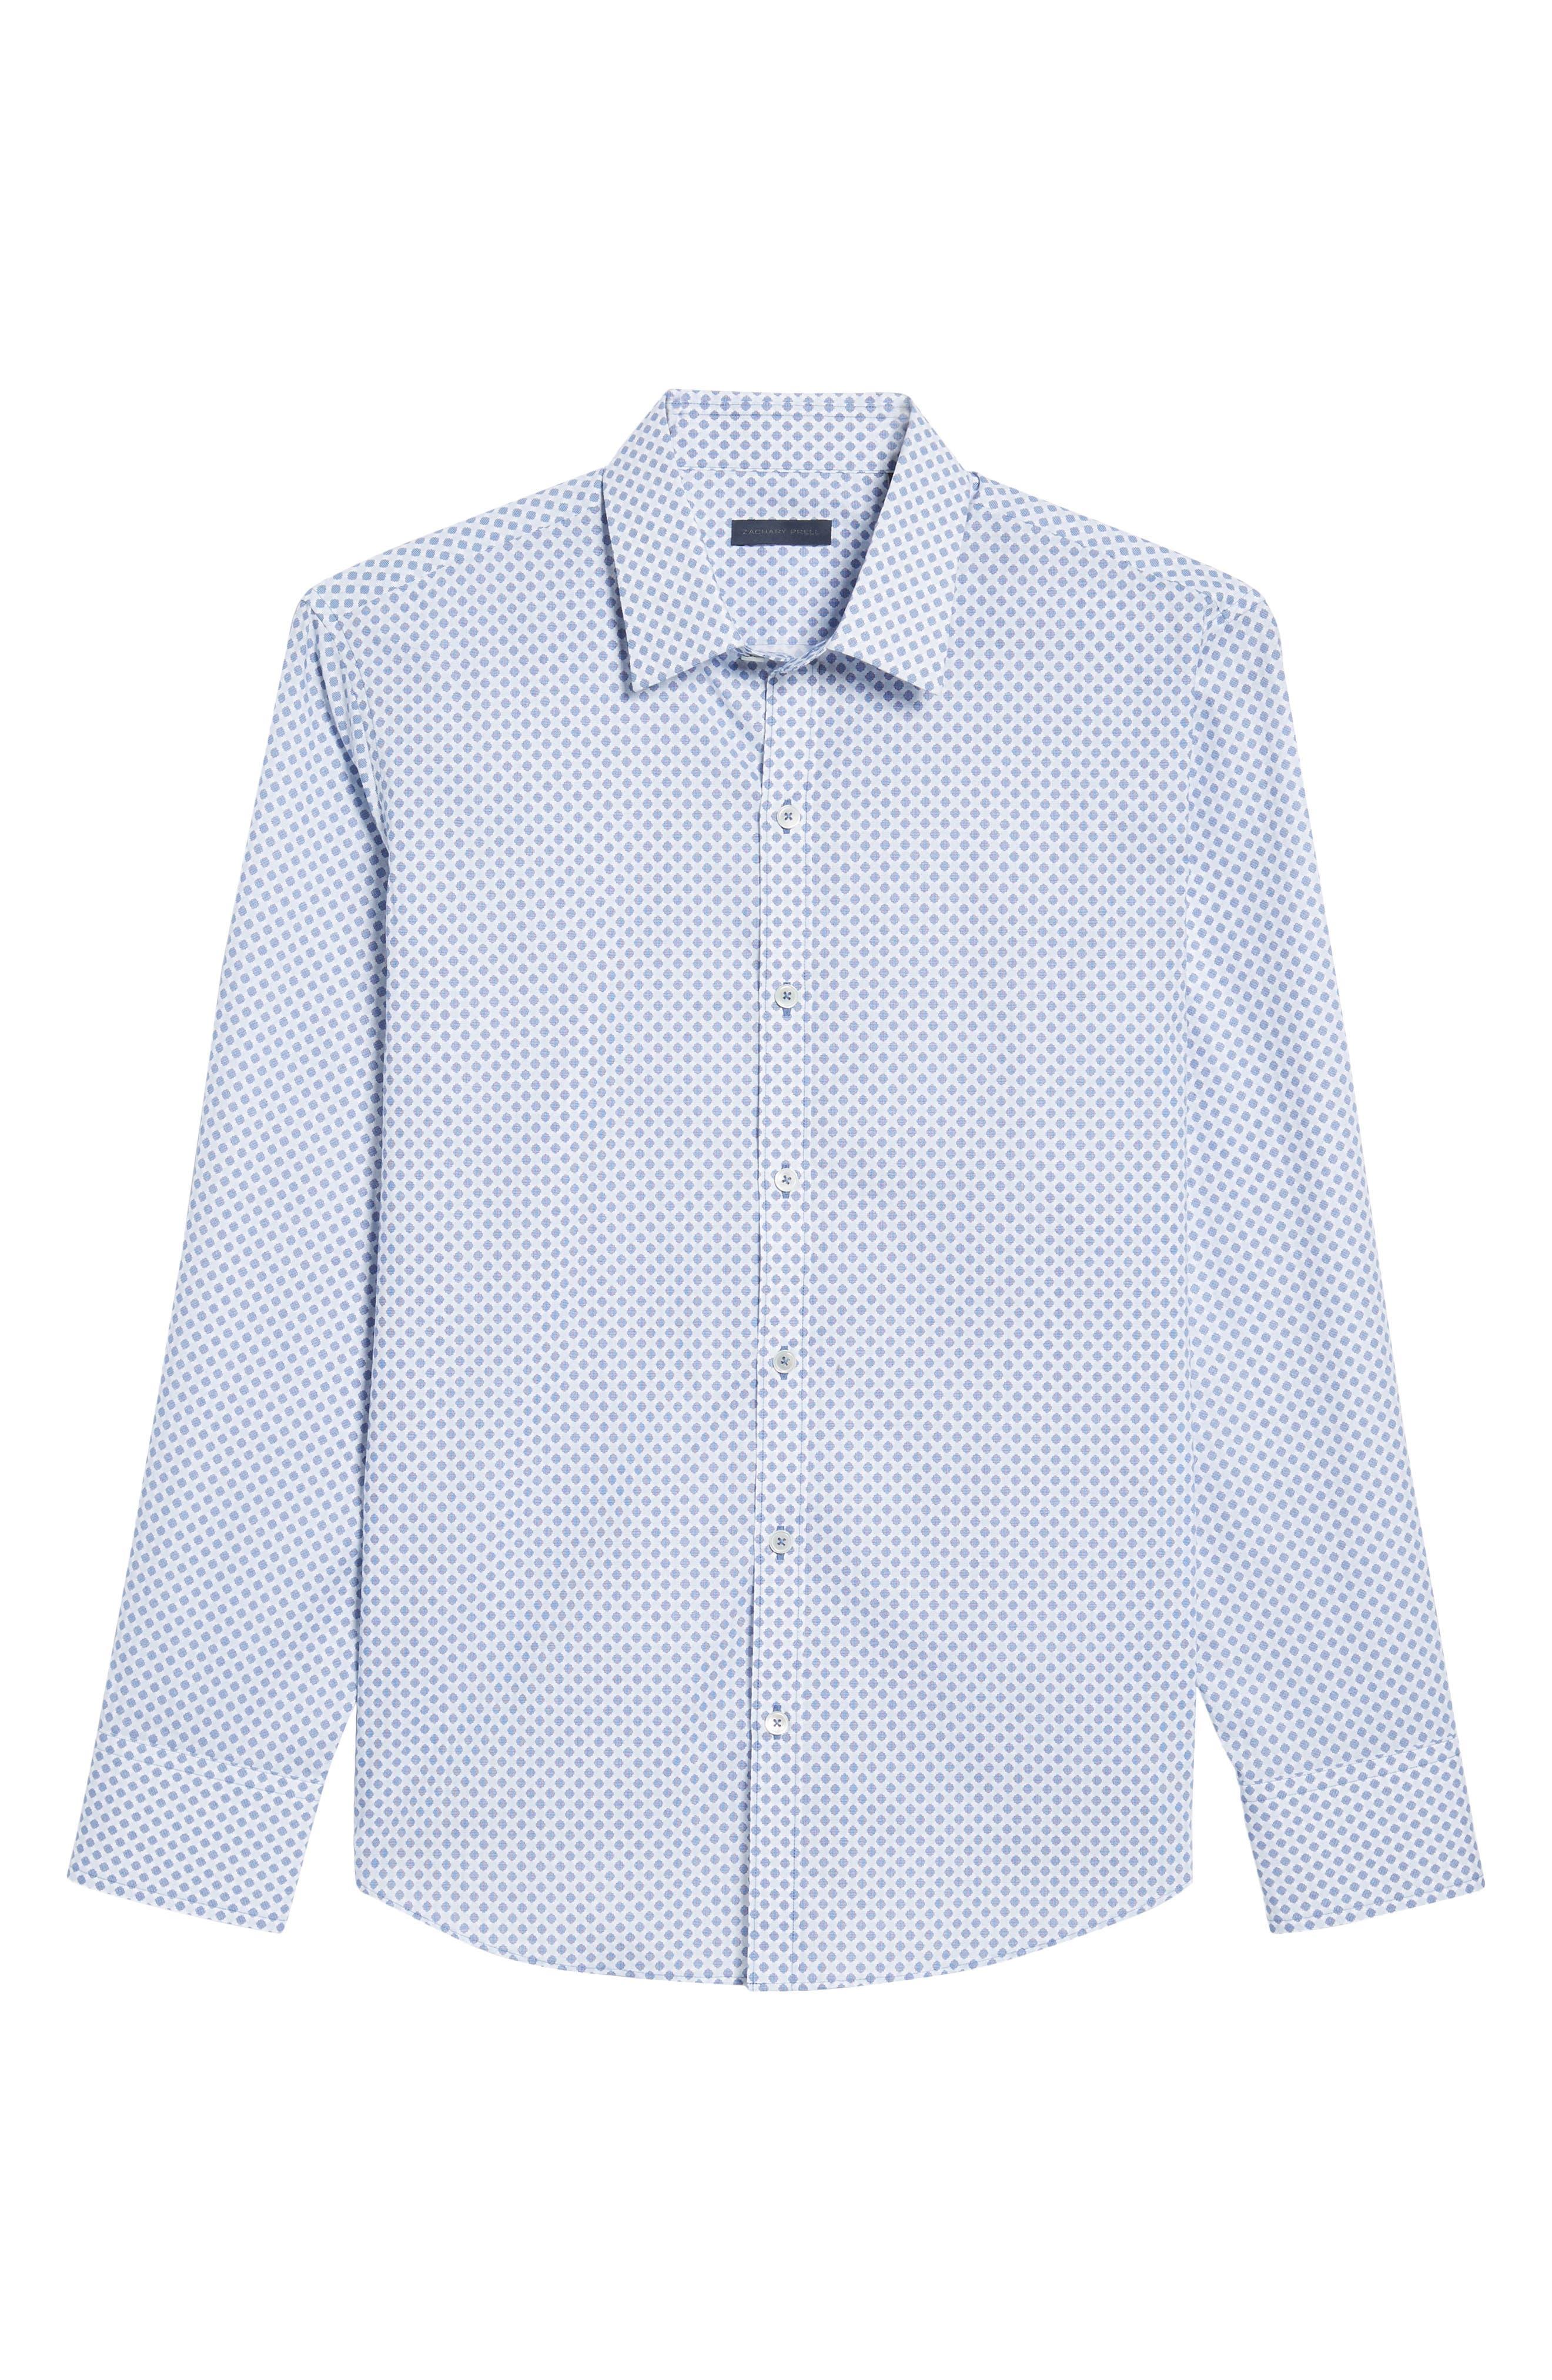 Obi Slim Fit Circle Print Sport Shirt,                             Alternate thumbnail 6, color,                             Navy